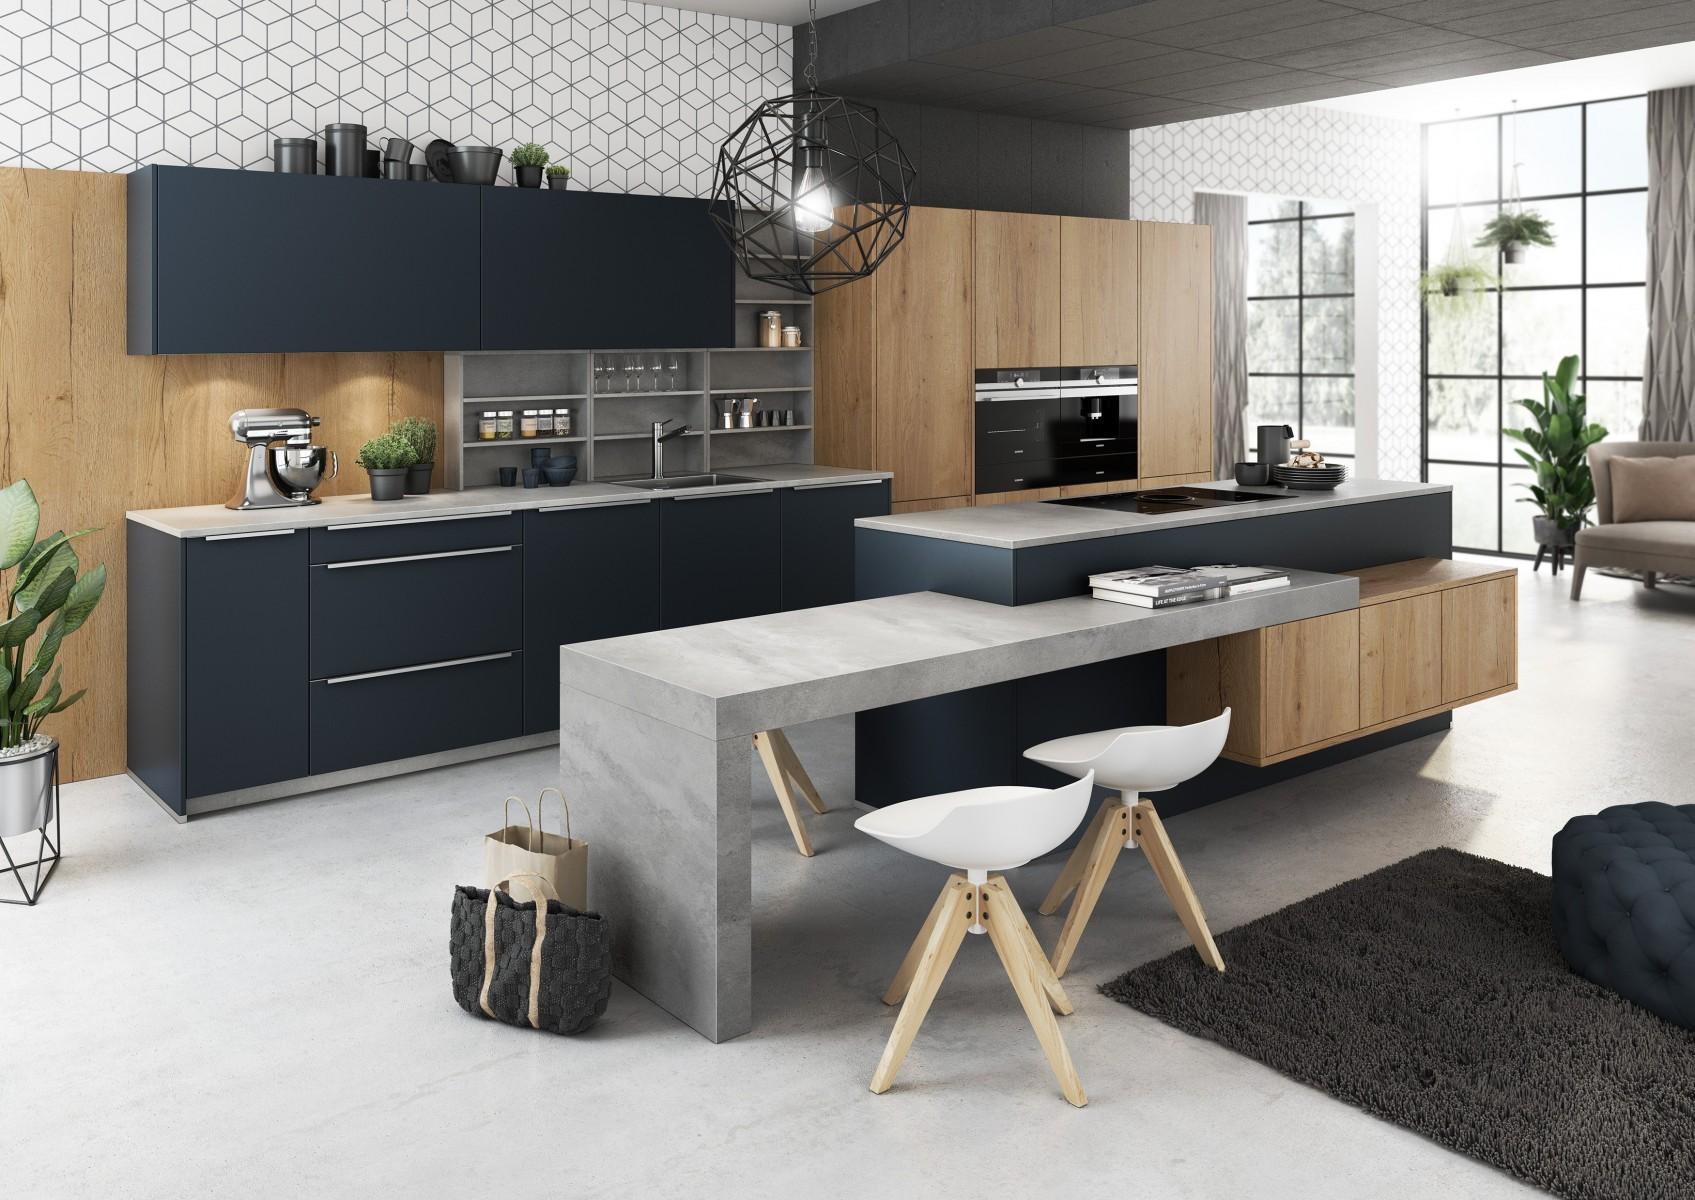 Artego Küche Dunkel